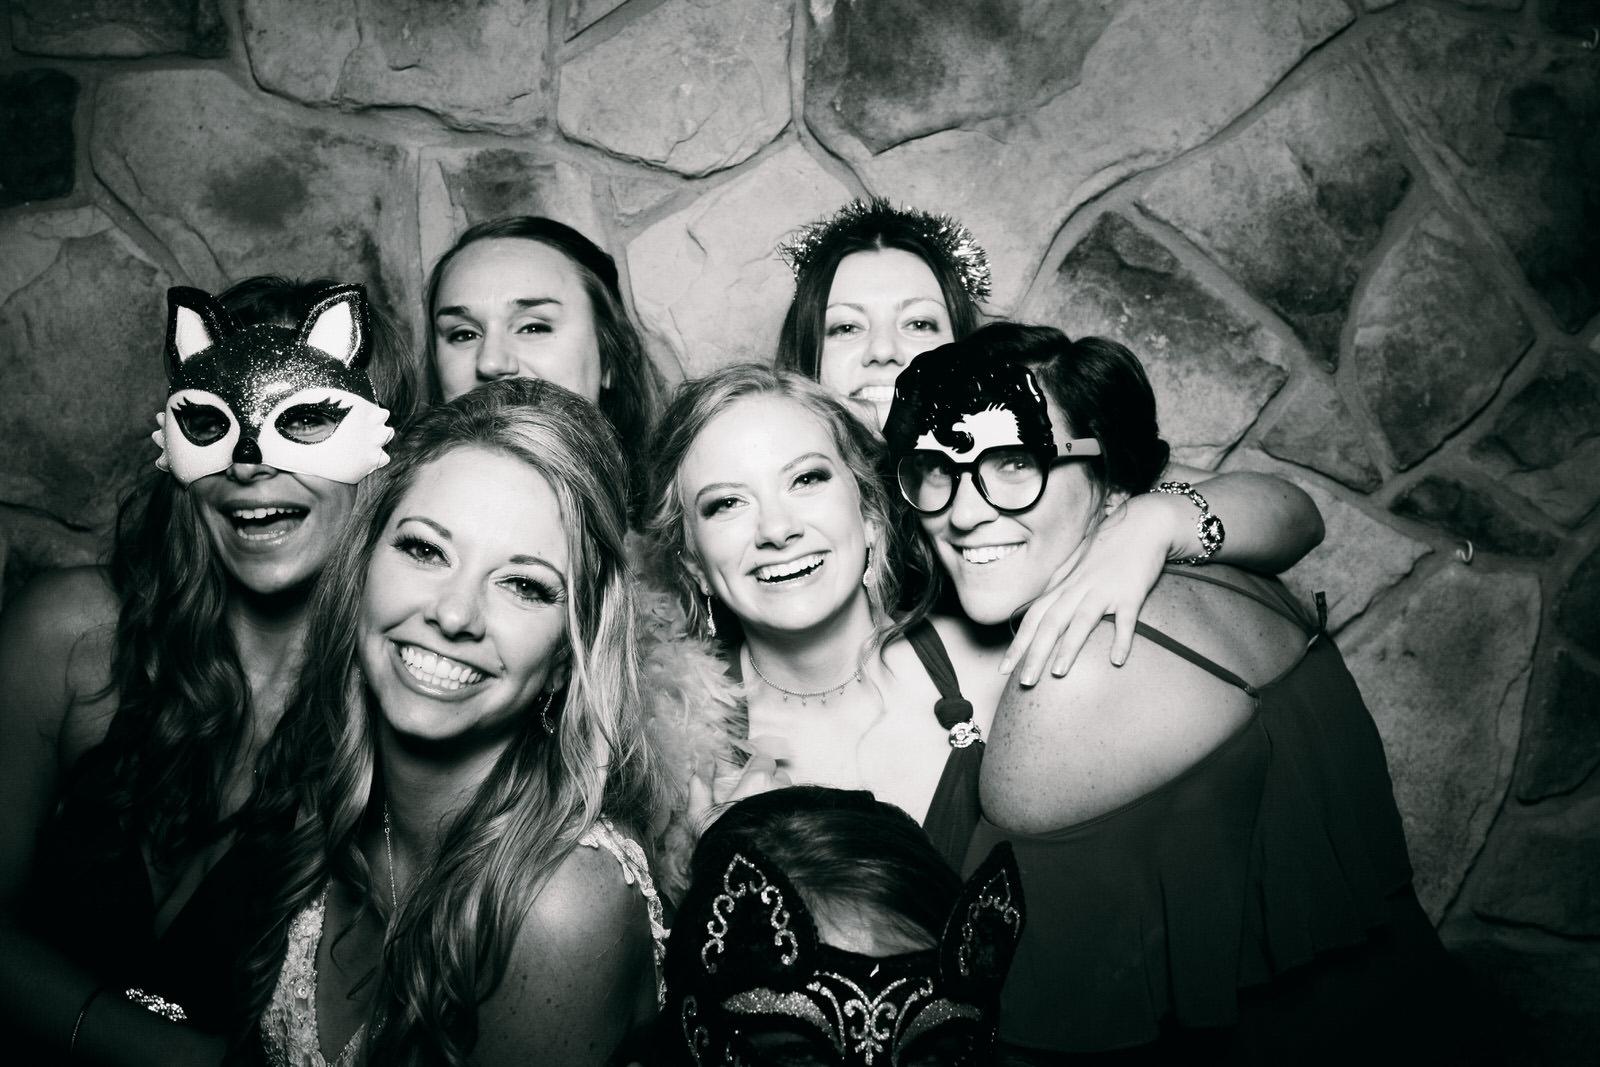 Jeanine-Sean-Wedding-Photo-Booth-12.jpg